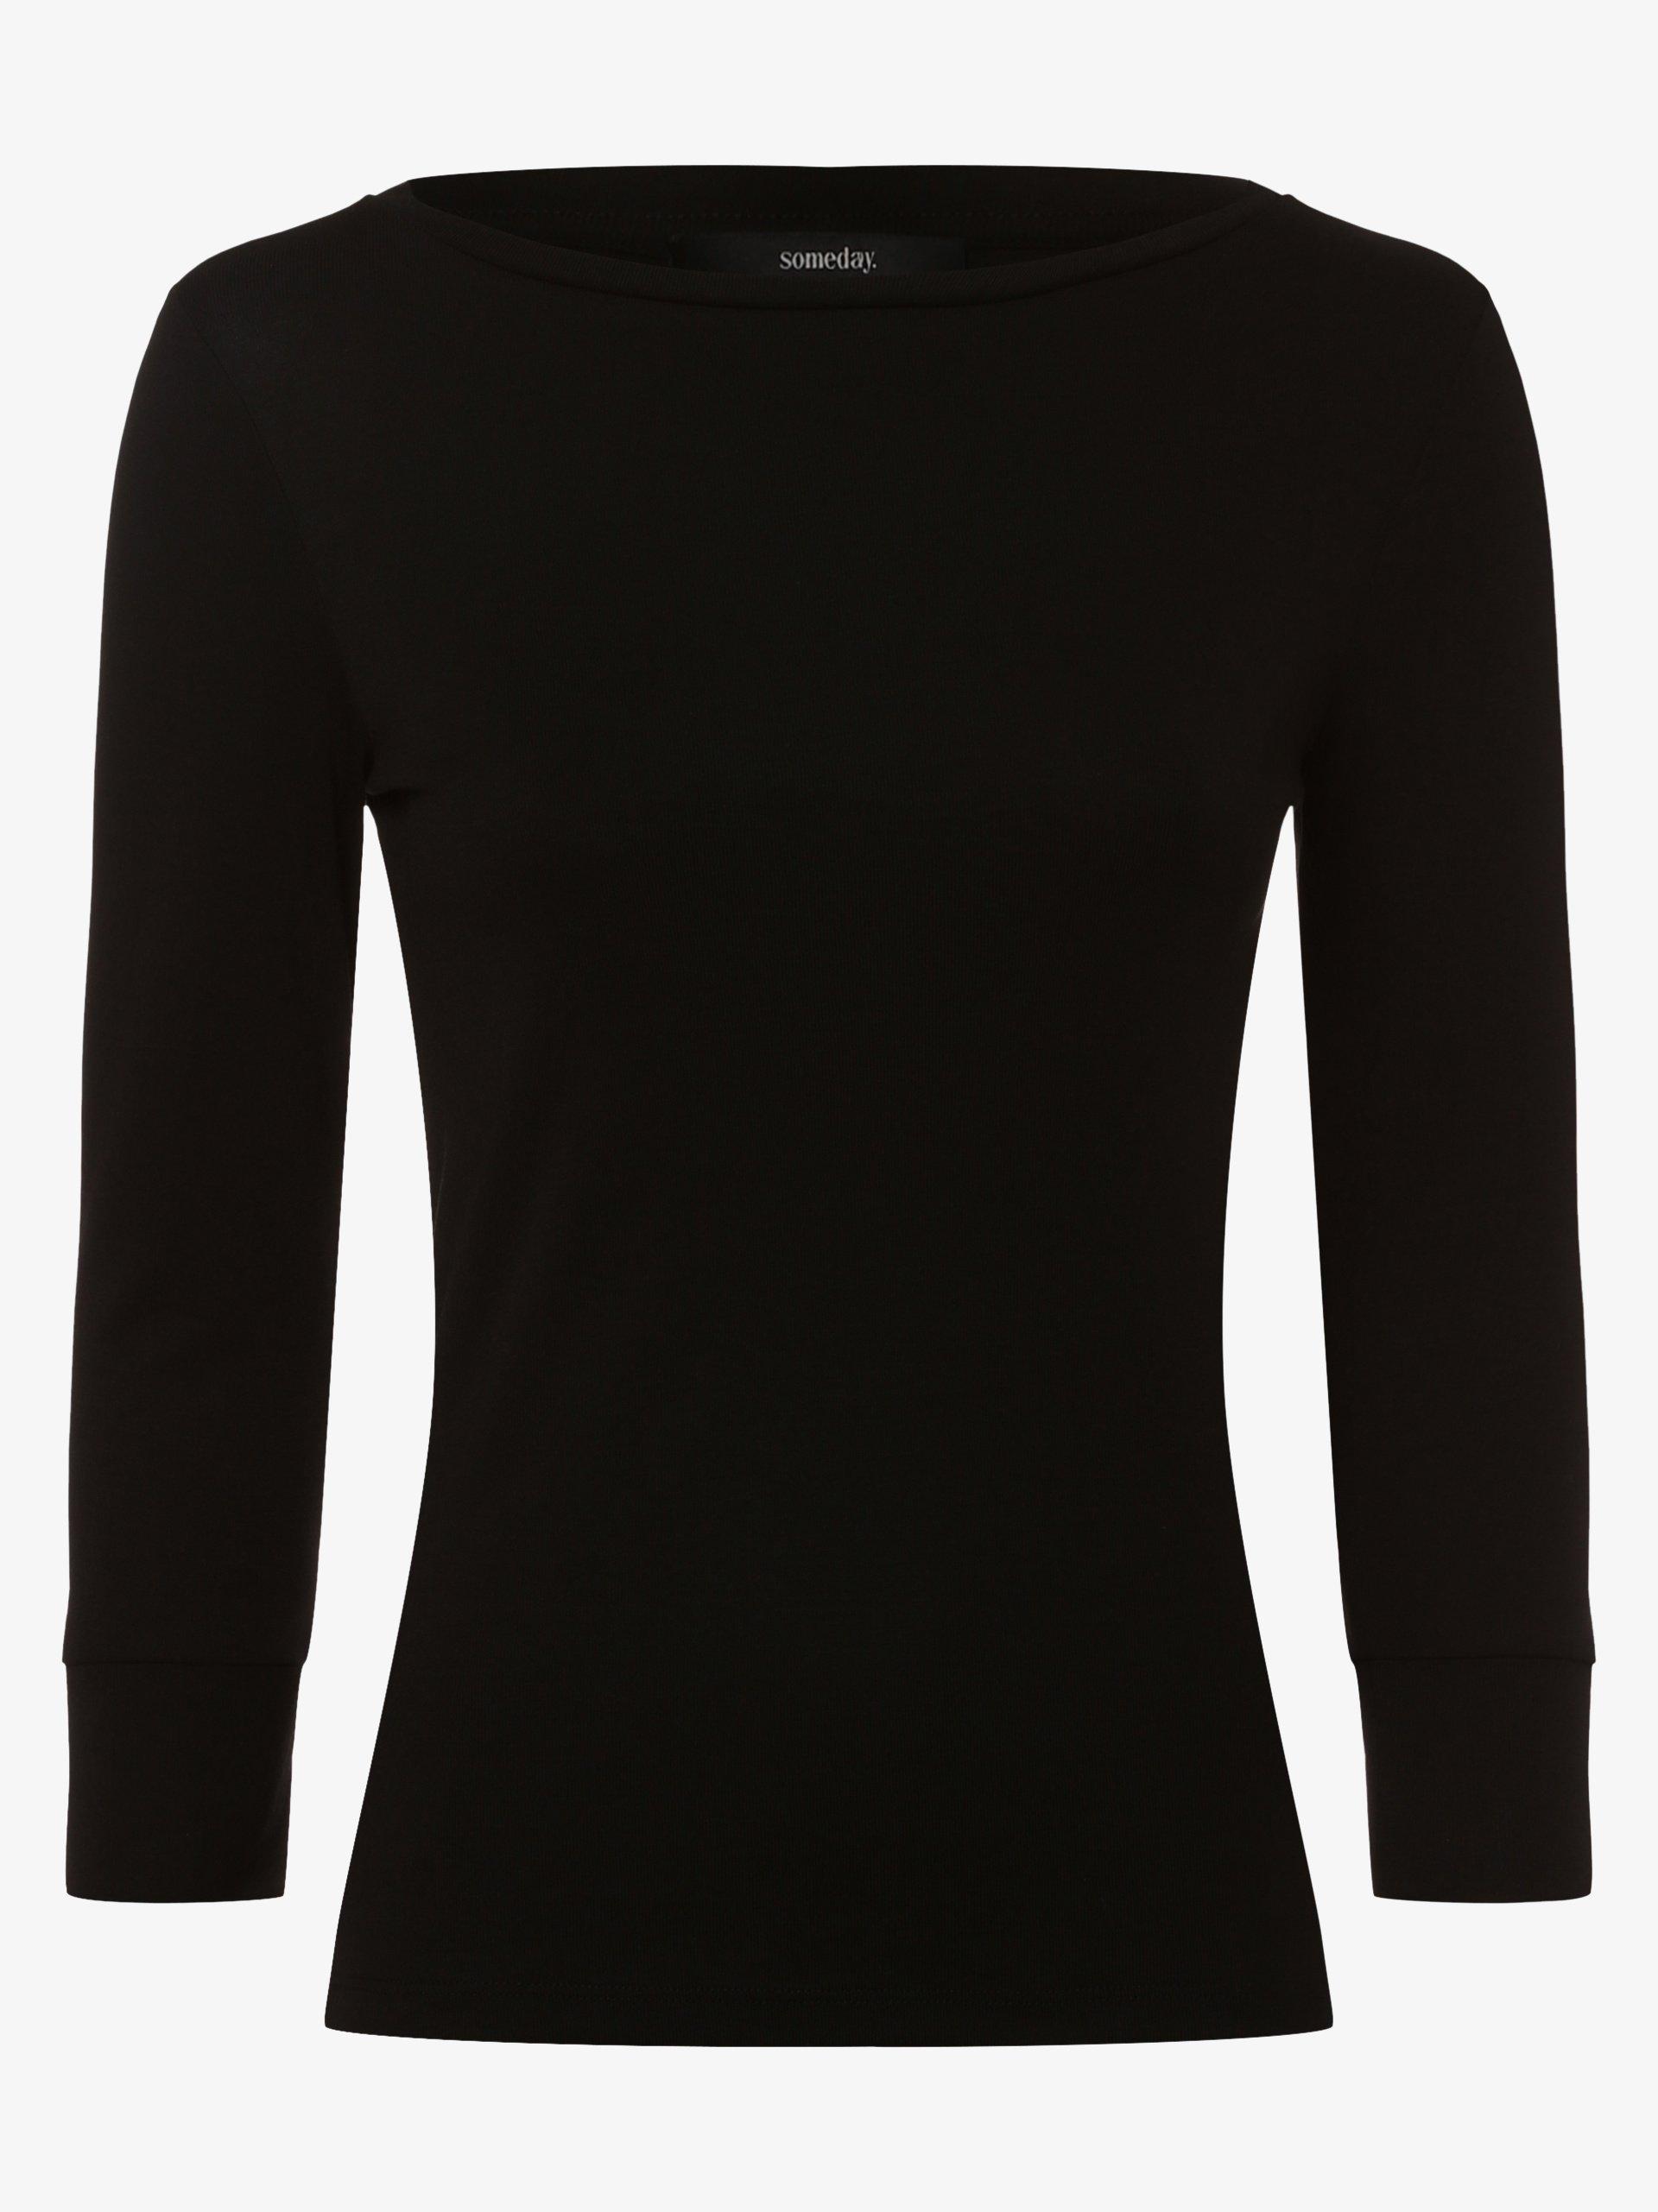 Someday Damen Shirt - Kima